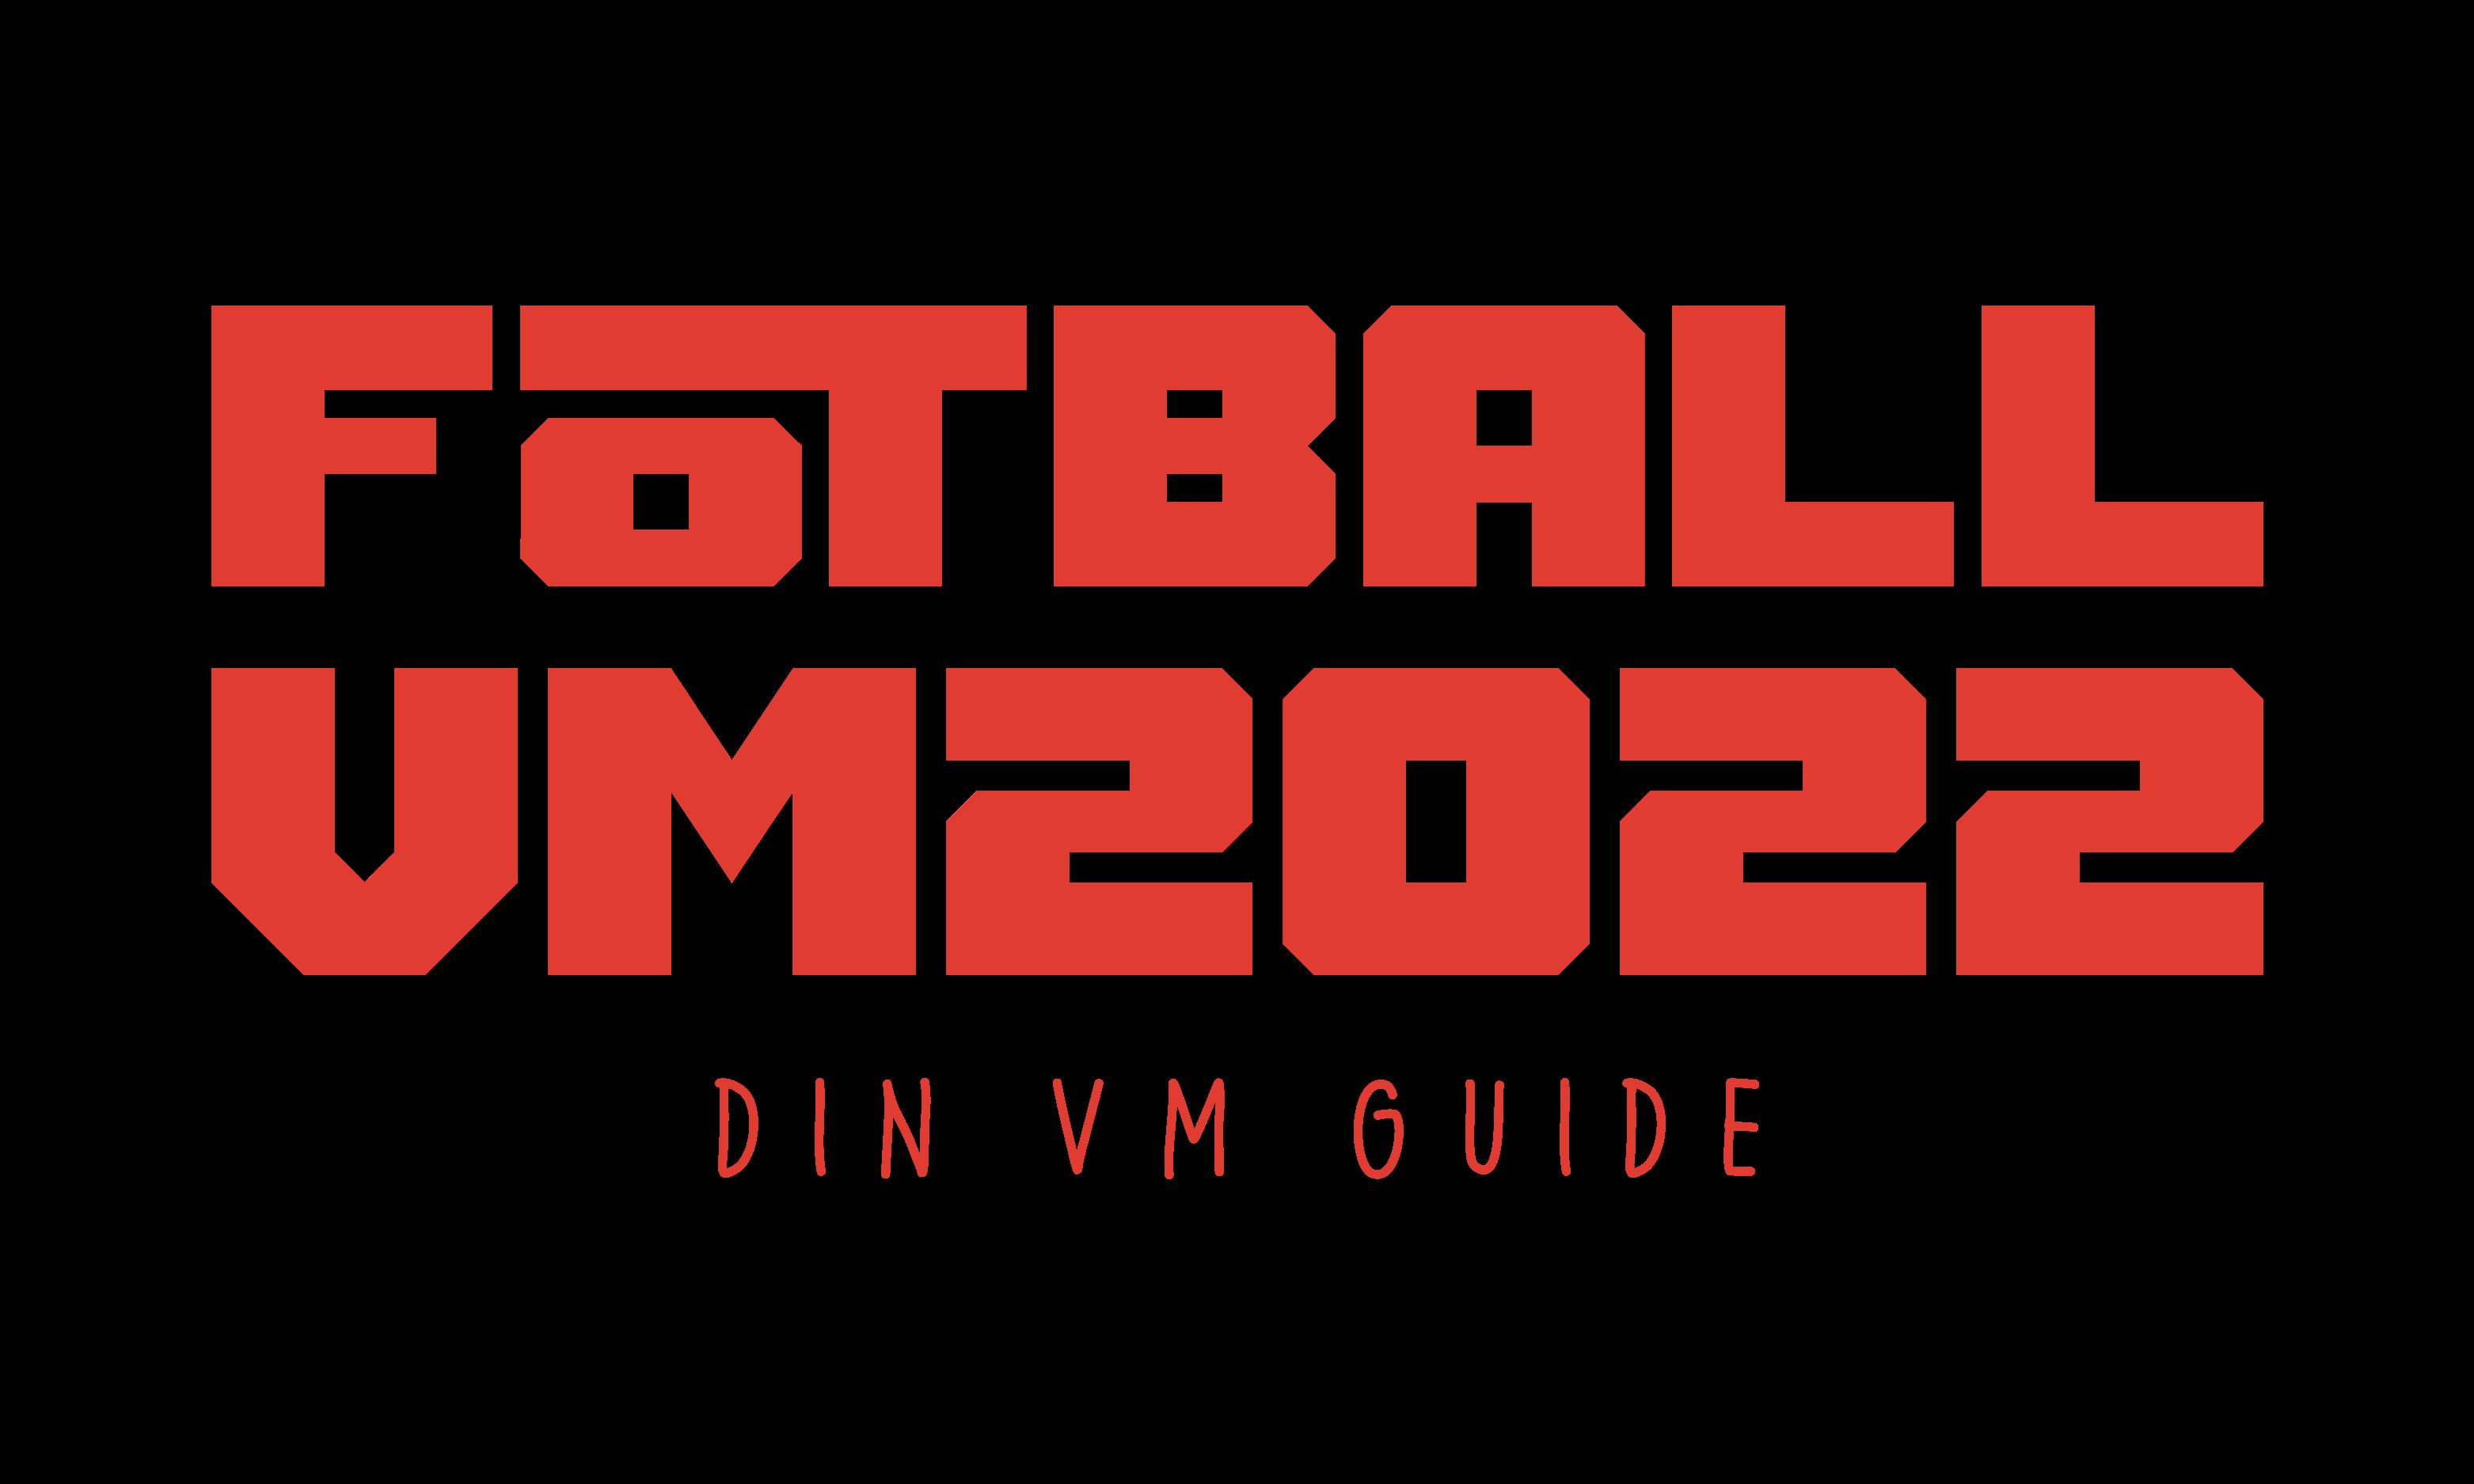 Fotball VM 2022 Qatar